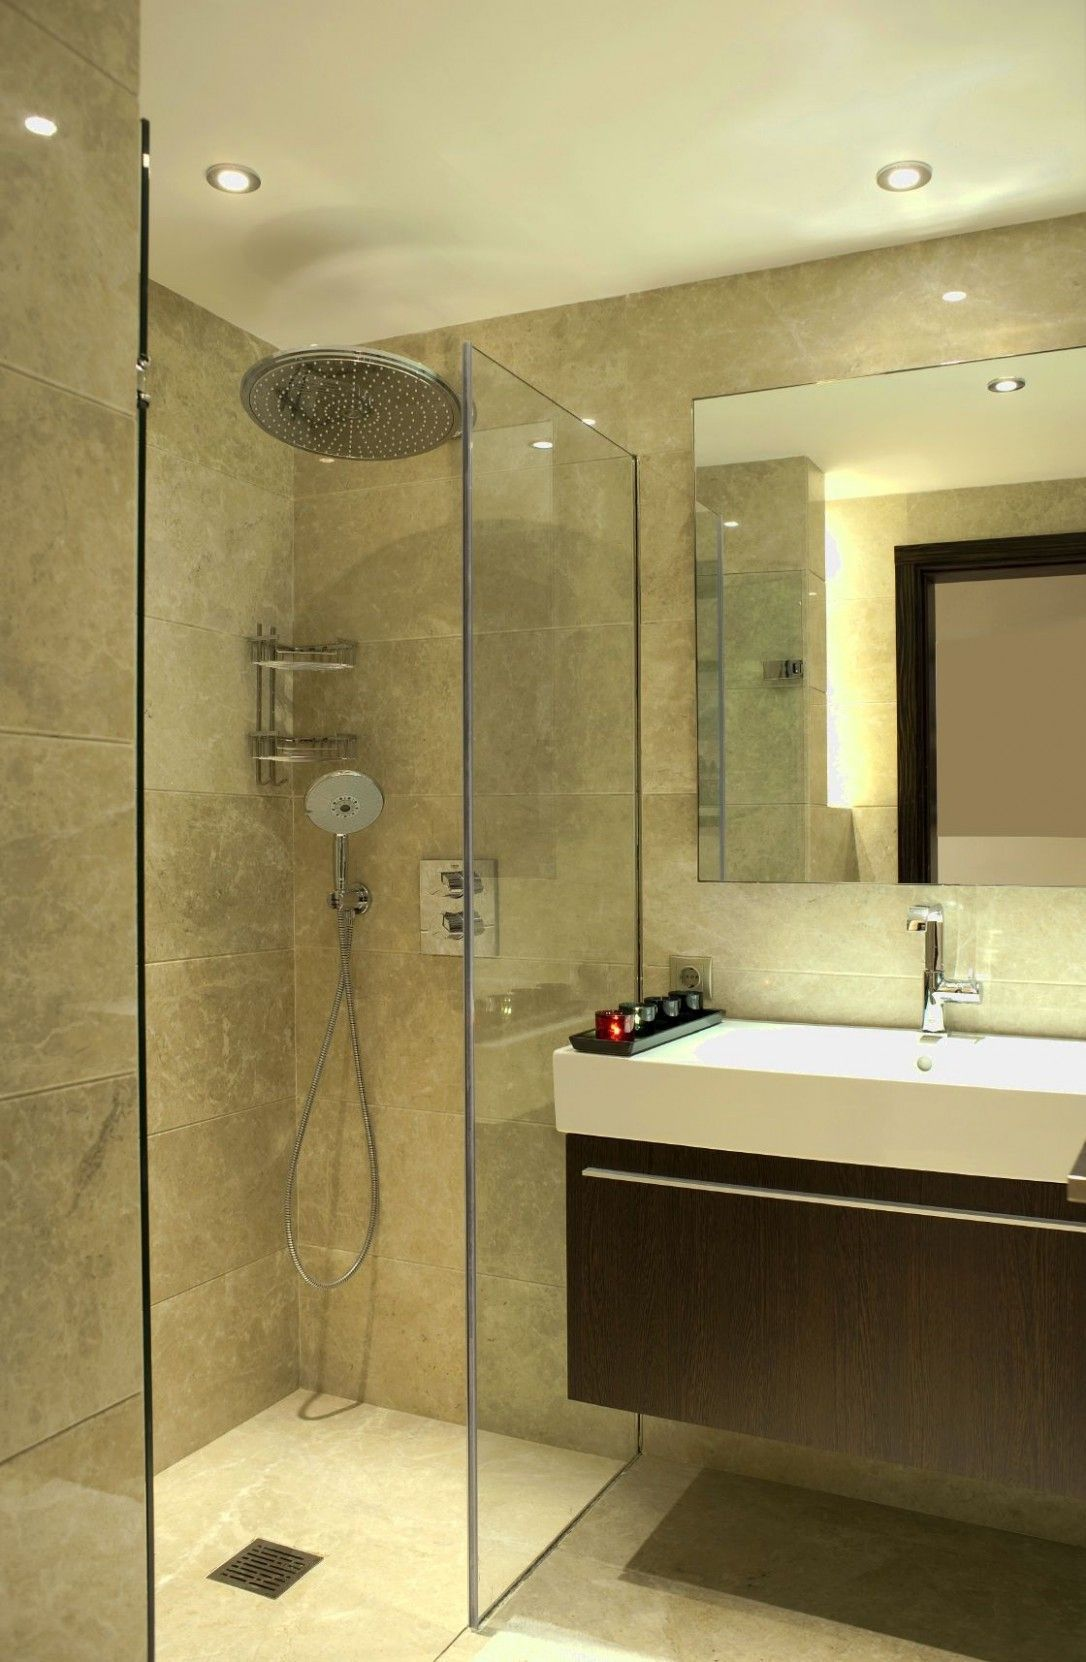 Bathroom Ideas For Small Ensuites Bathroom Ensuites Ideas Small Bathroom En Bathroom Ens Bathroom Design Luxury Modern Bathroom Modern Bathroom Design Ensuite bathroom design ideas